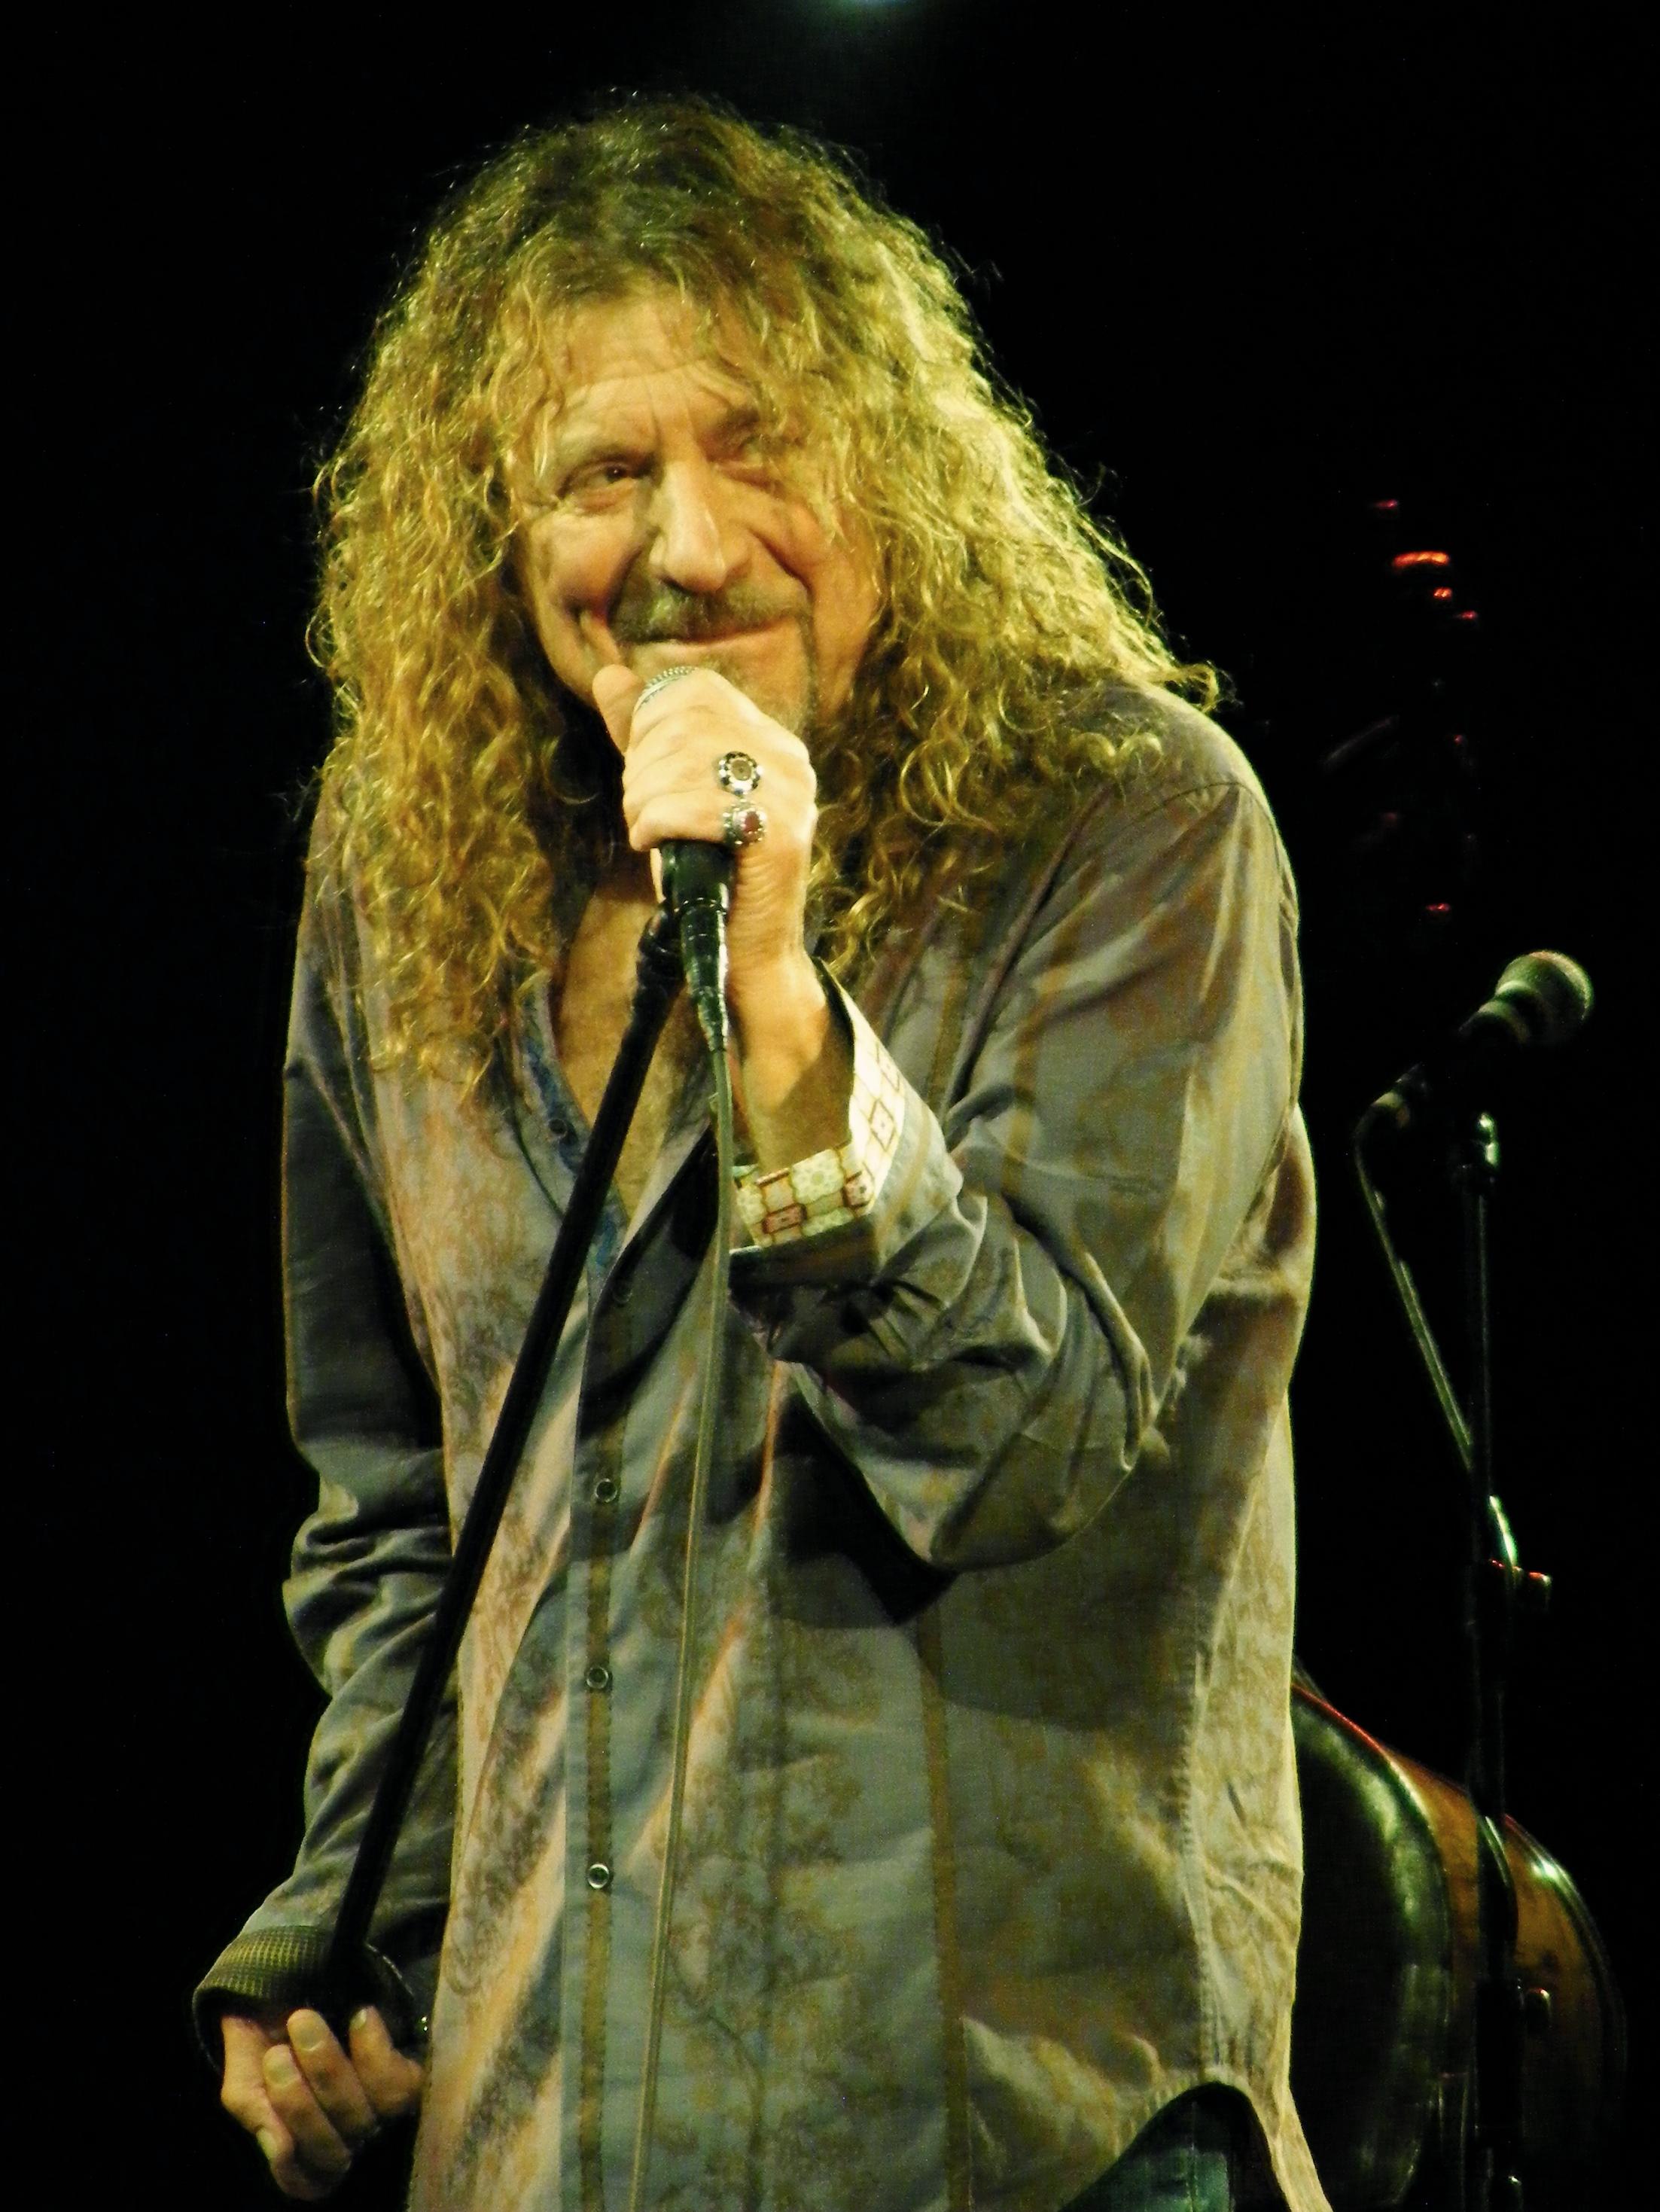 Depiction of Robert Plant